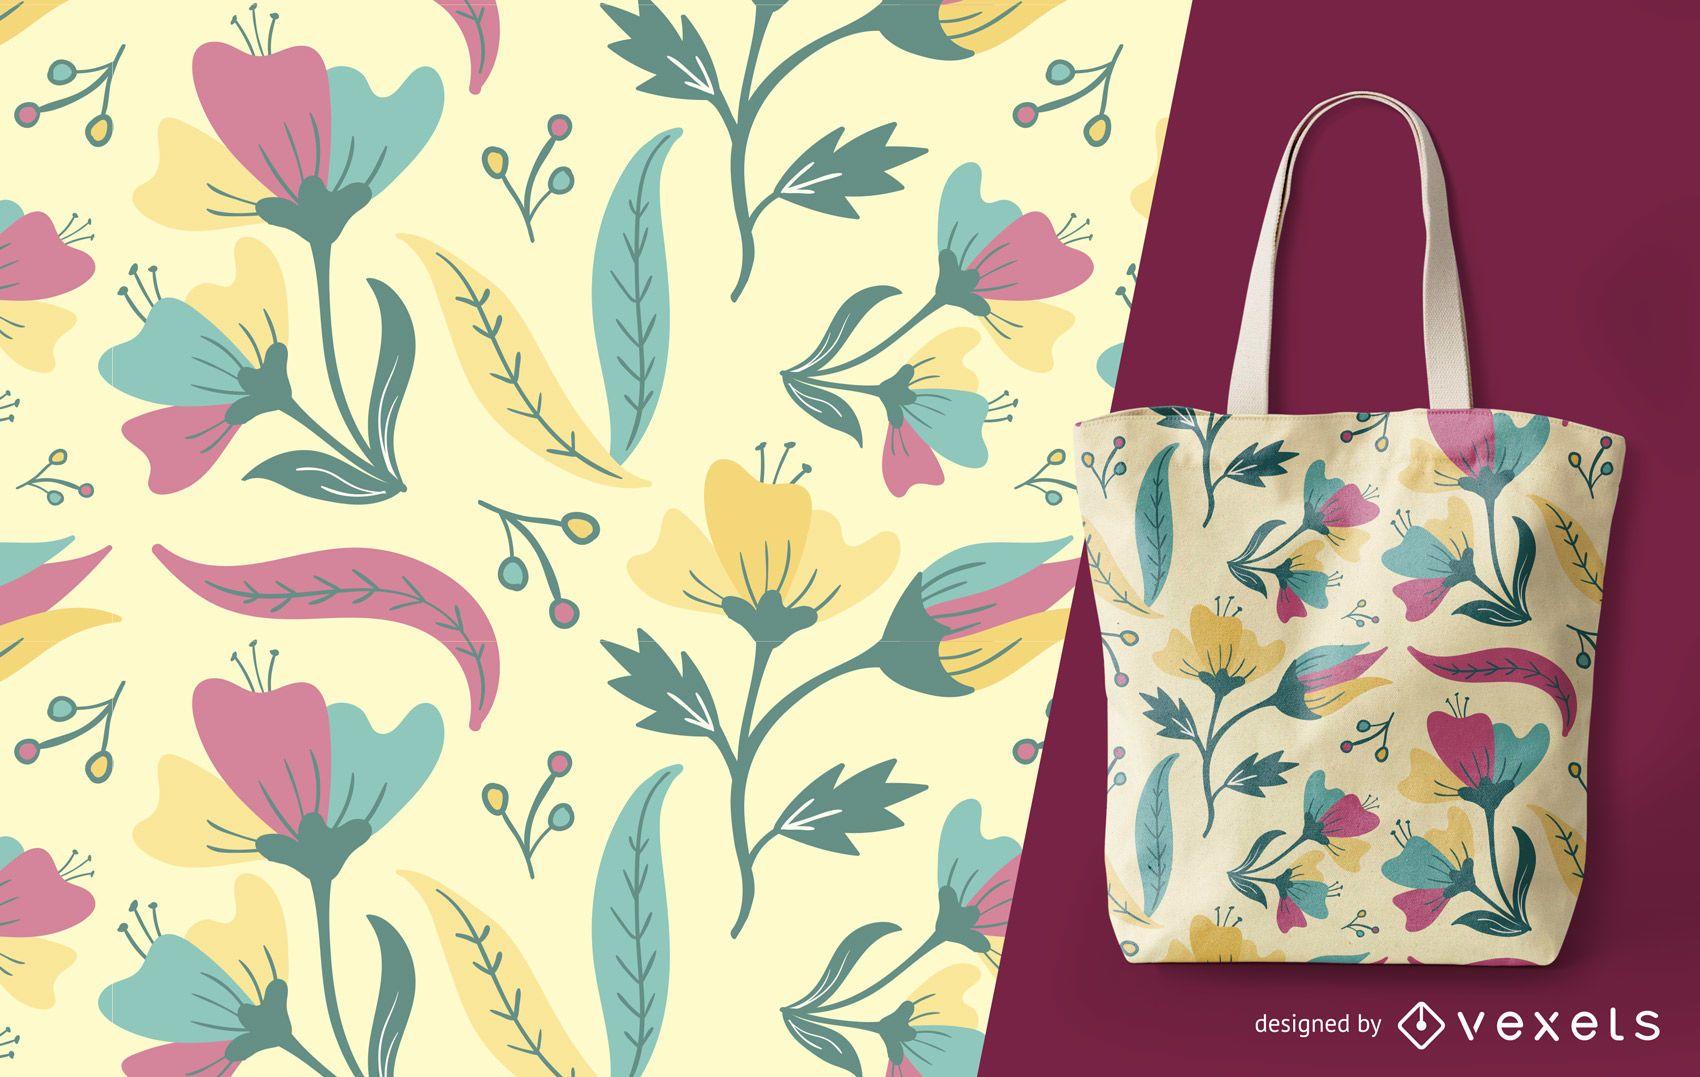 Detailed Summer Floral Pattern